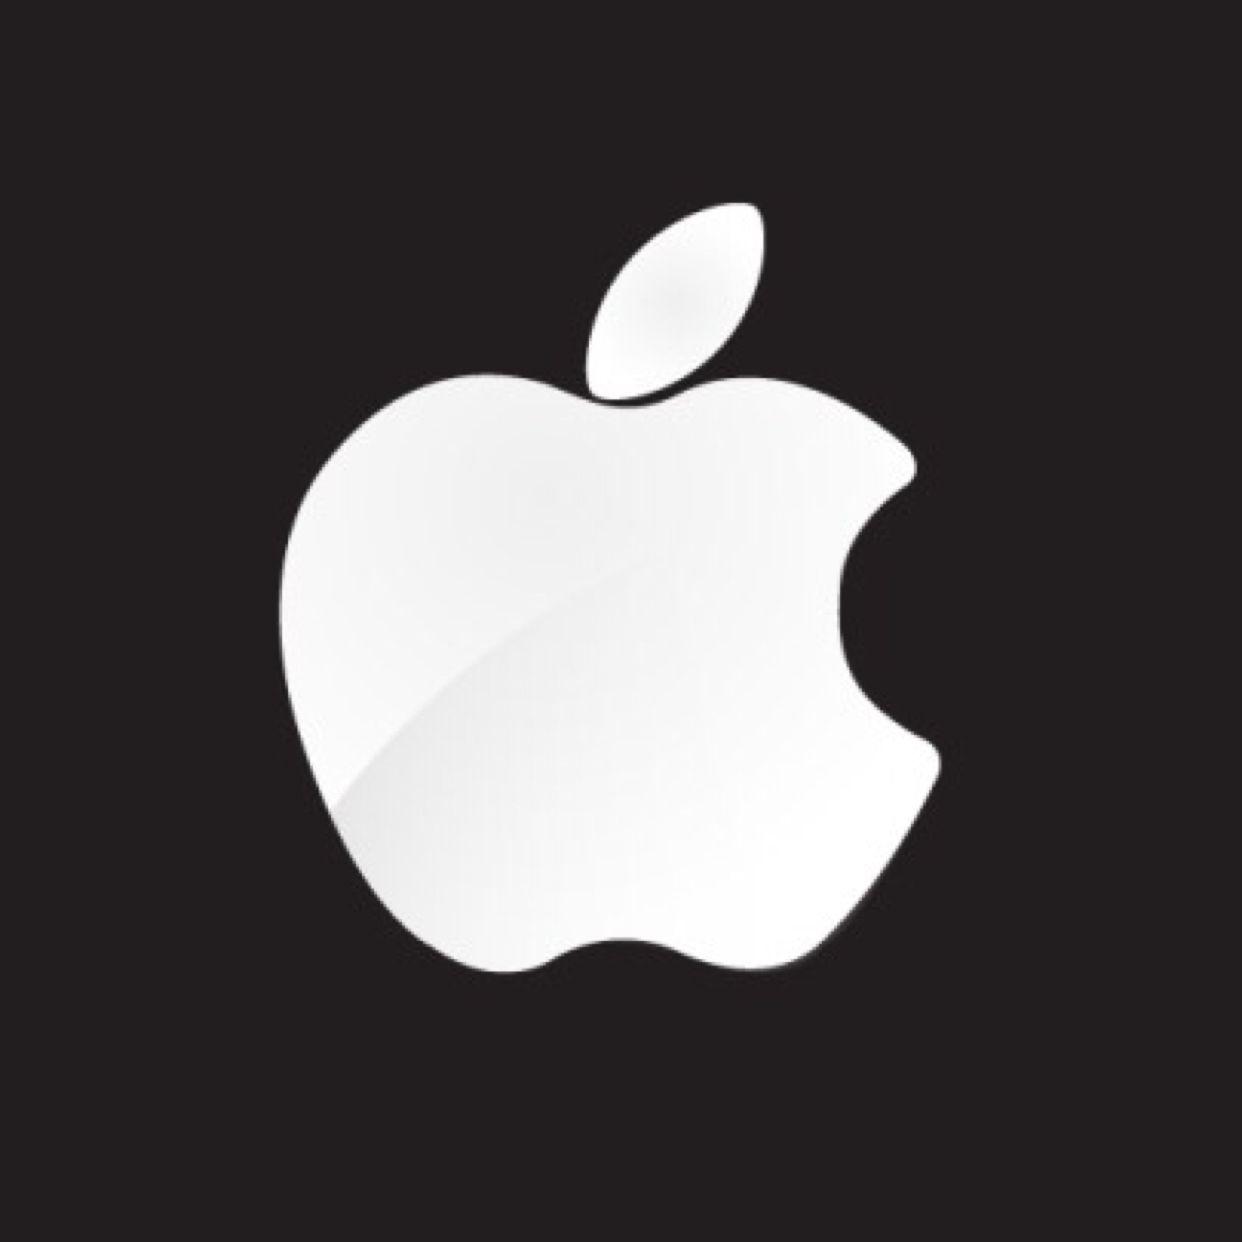 iphone8上市前 苹果电视曝光OLED屏幕抢眼